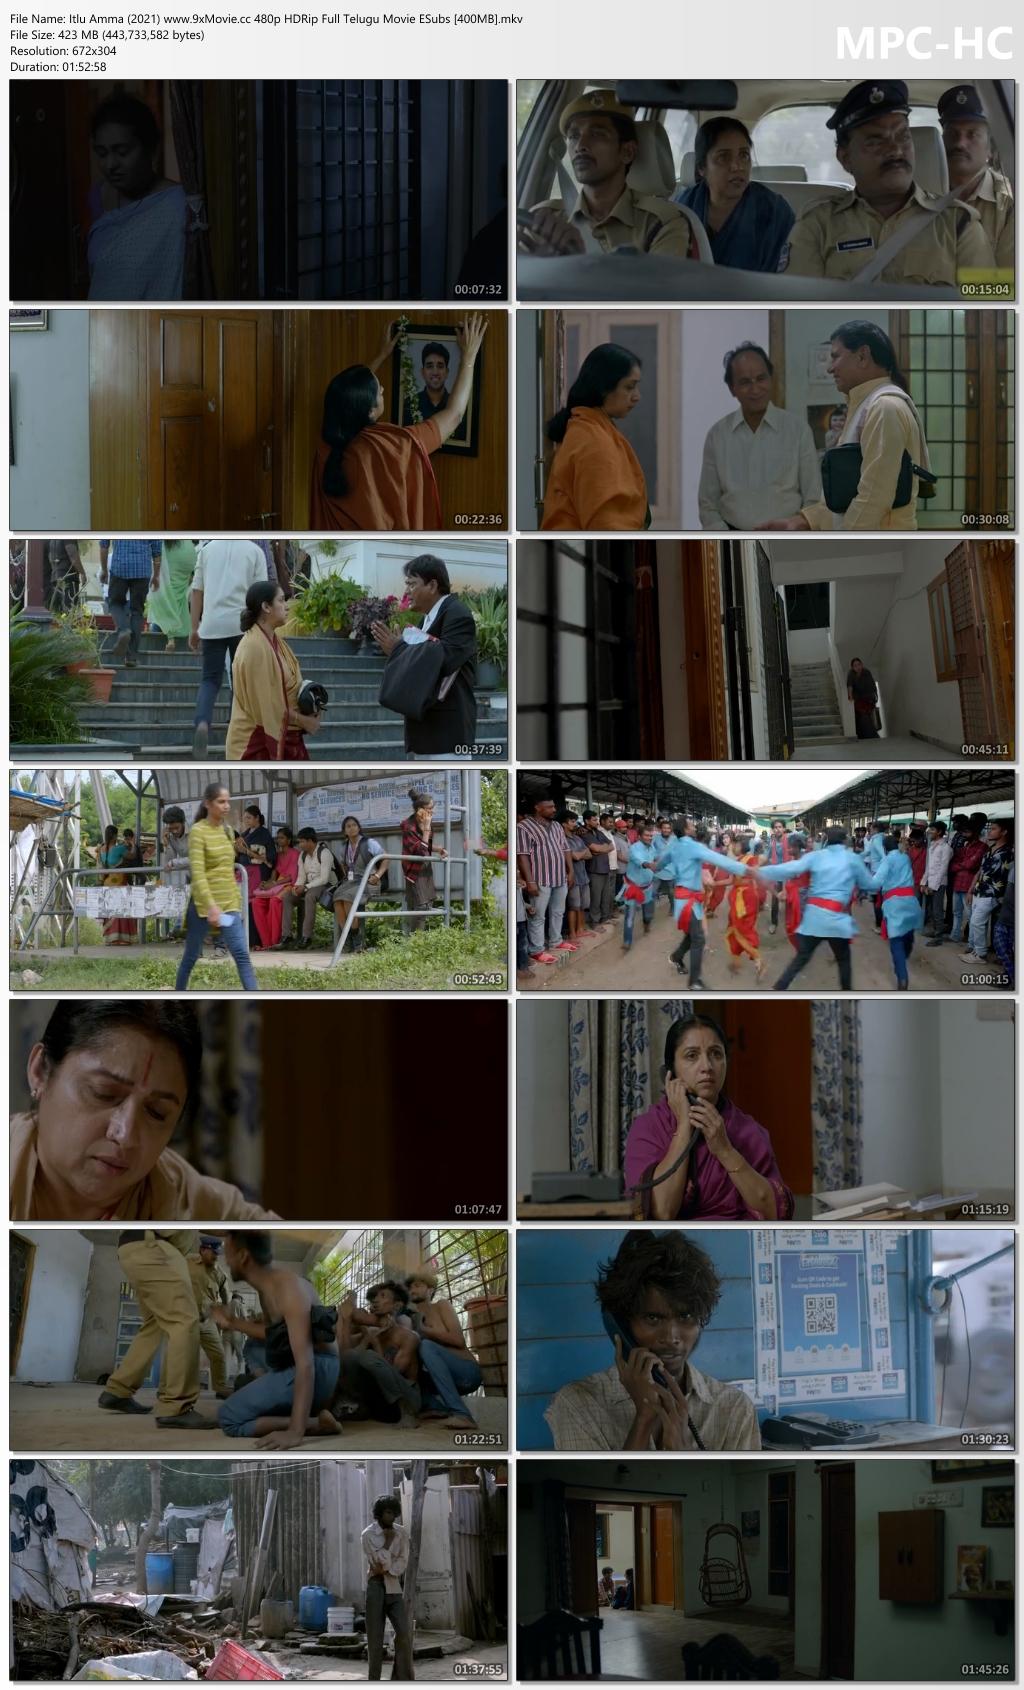 Itlu-Amma-2021-www-9x-Movie-cc-480p-HDRip-Full-Telugu-Movie-ESubs-400-MB-mkv